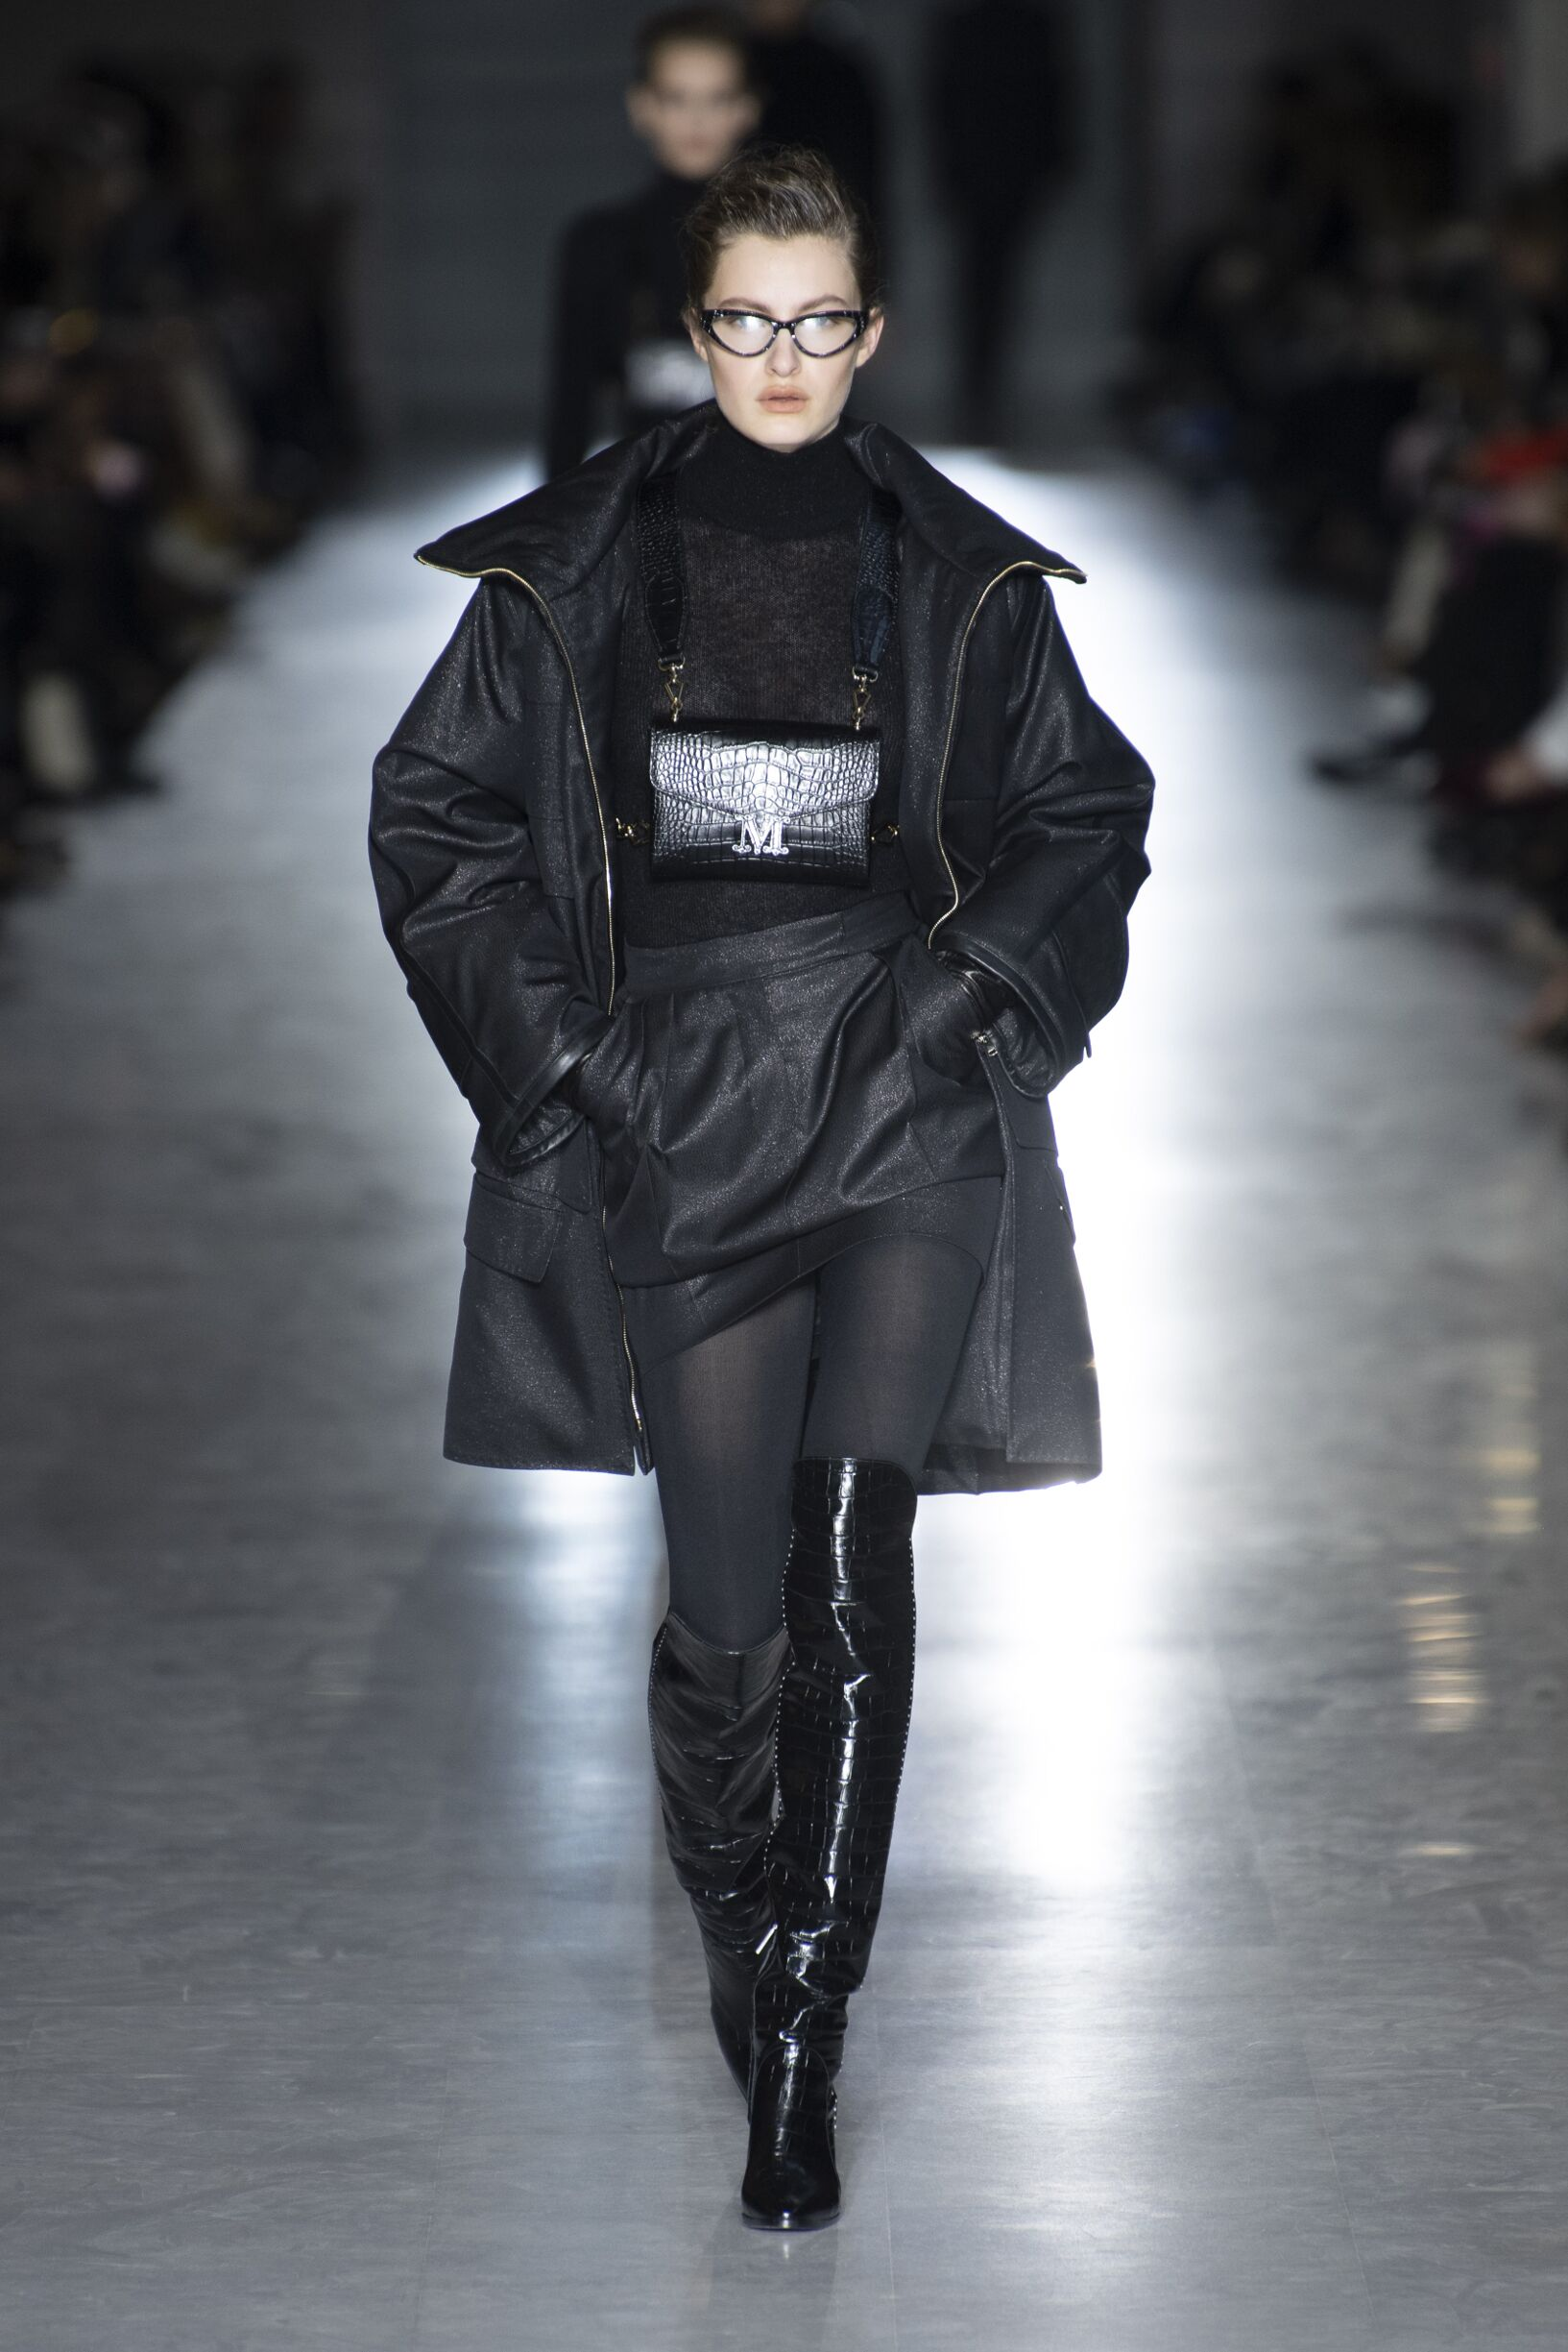 Womenswear Winter Max Mara 2019